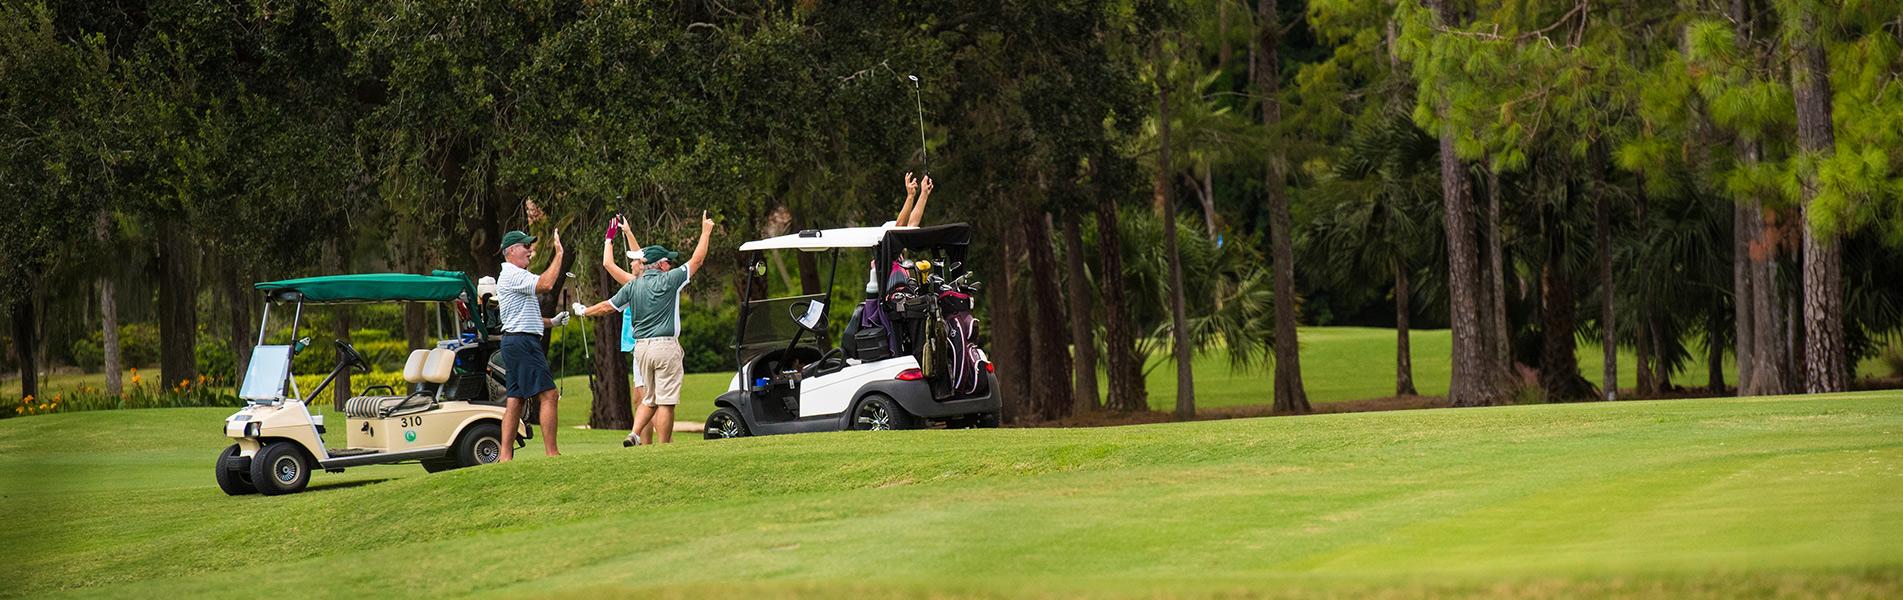 FGCU Founder's Cup Golf Tournament